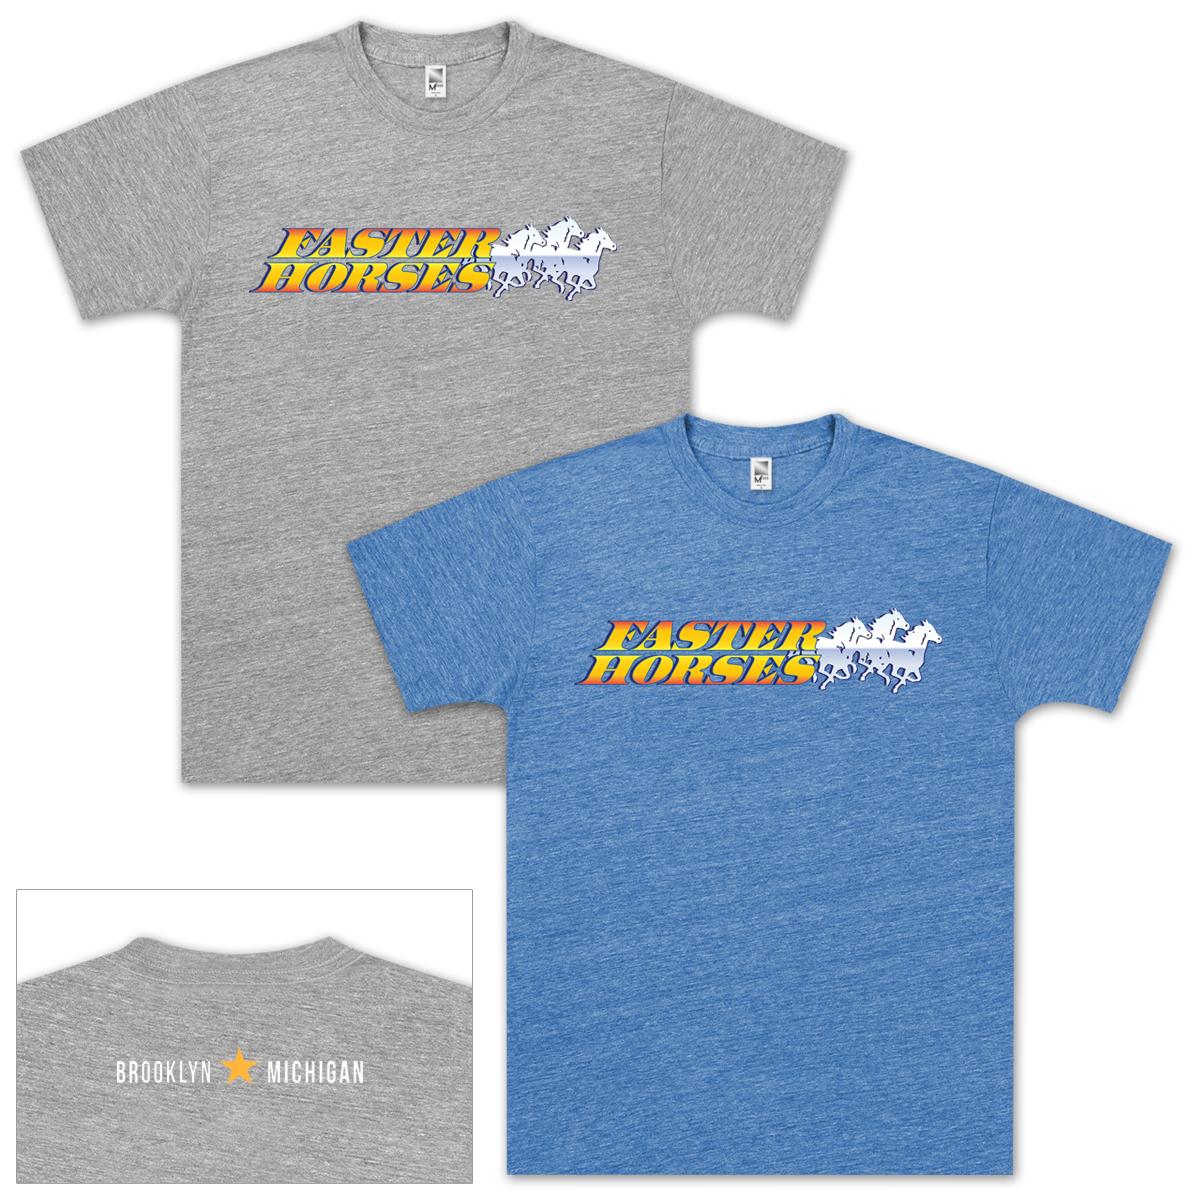 FasterHorses Festival Tri-Blend T-Shirt